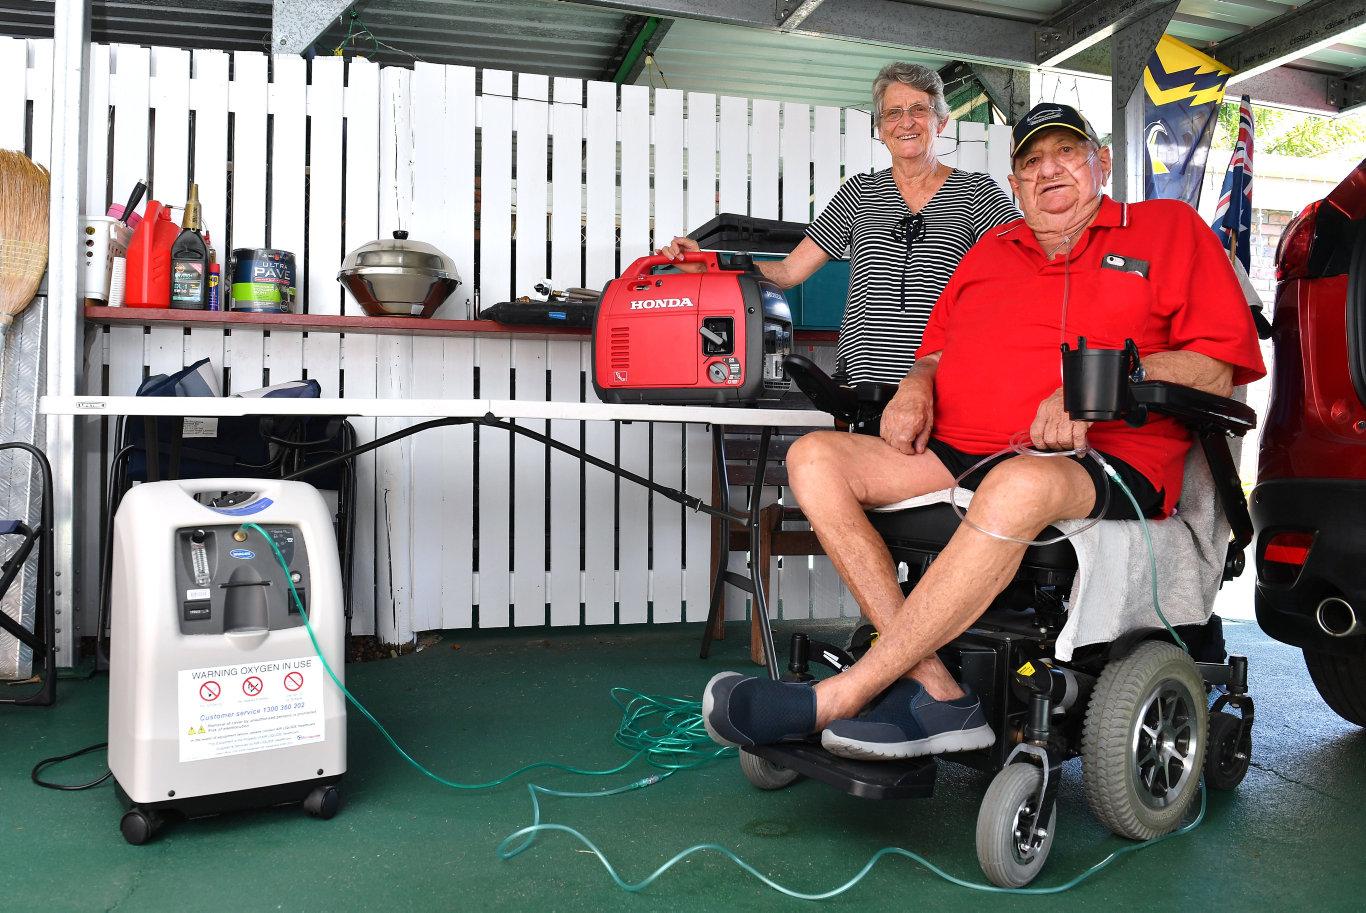 Bill and Trish Senn who won a Honda Generator.